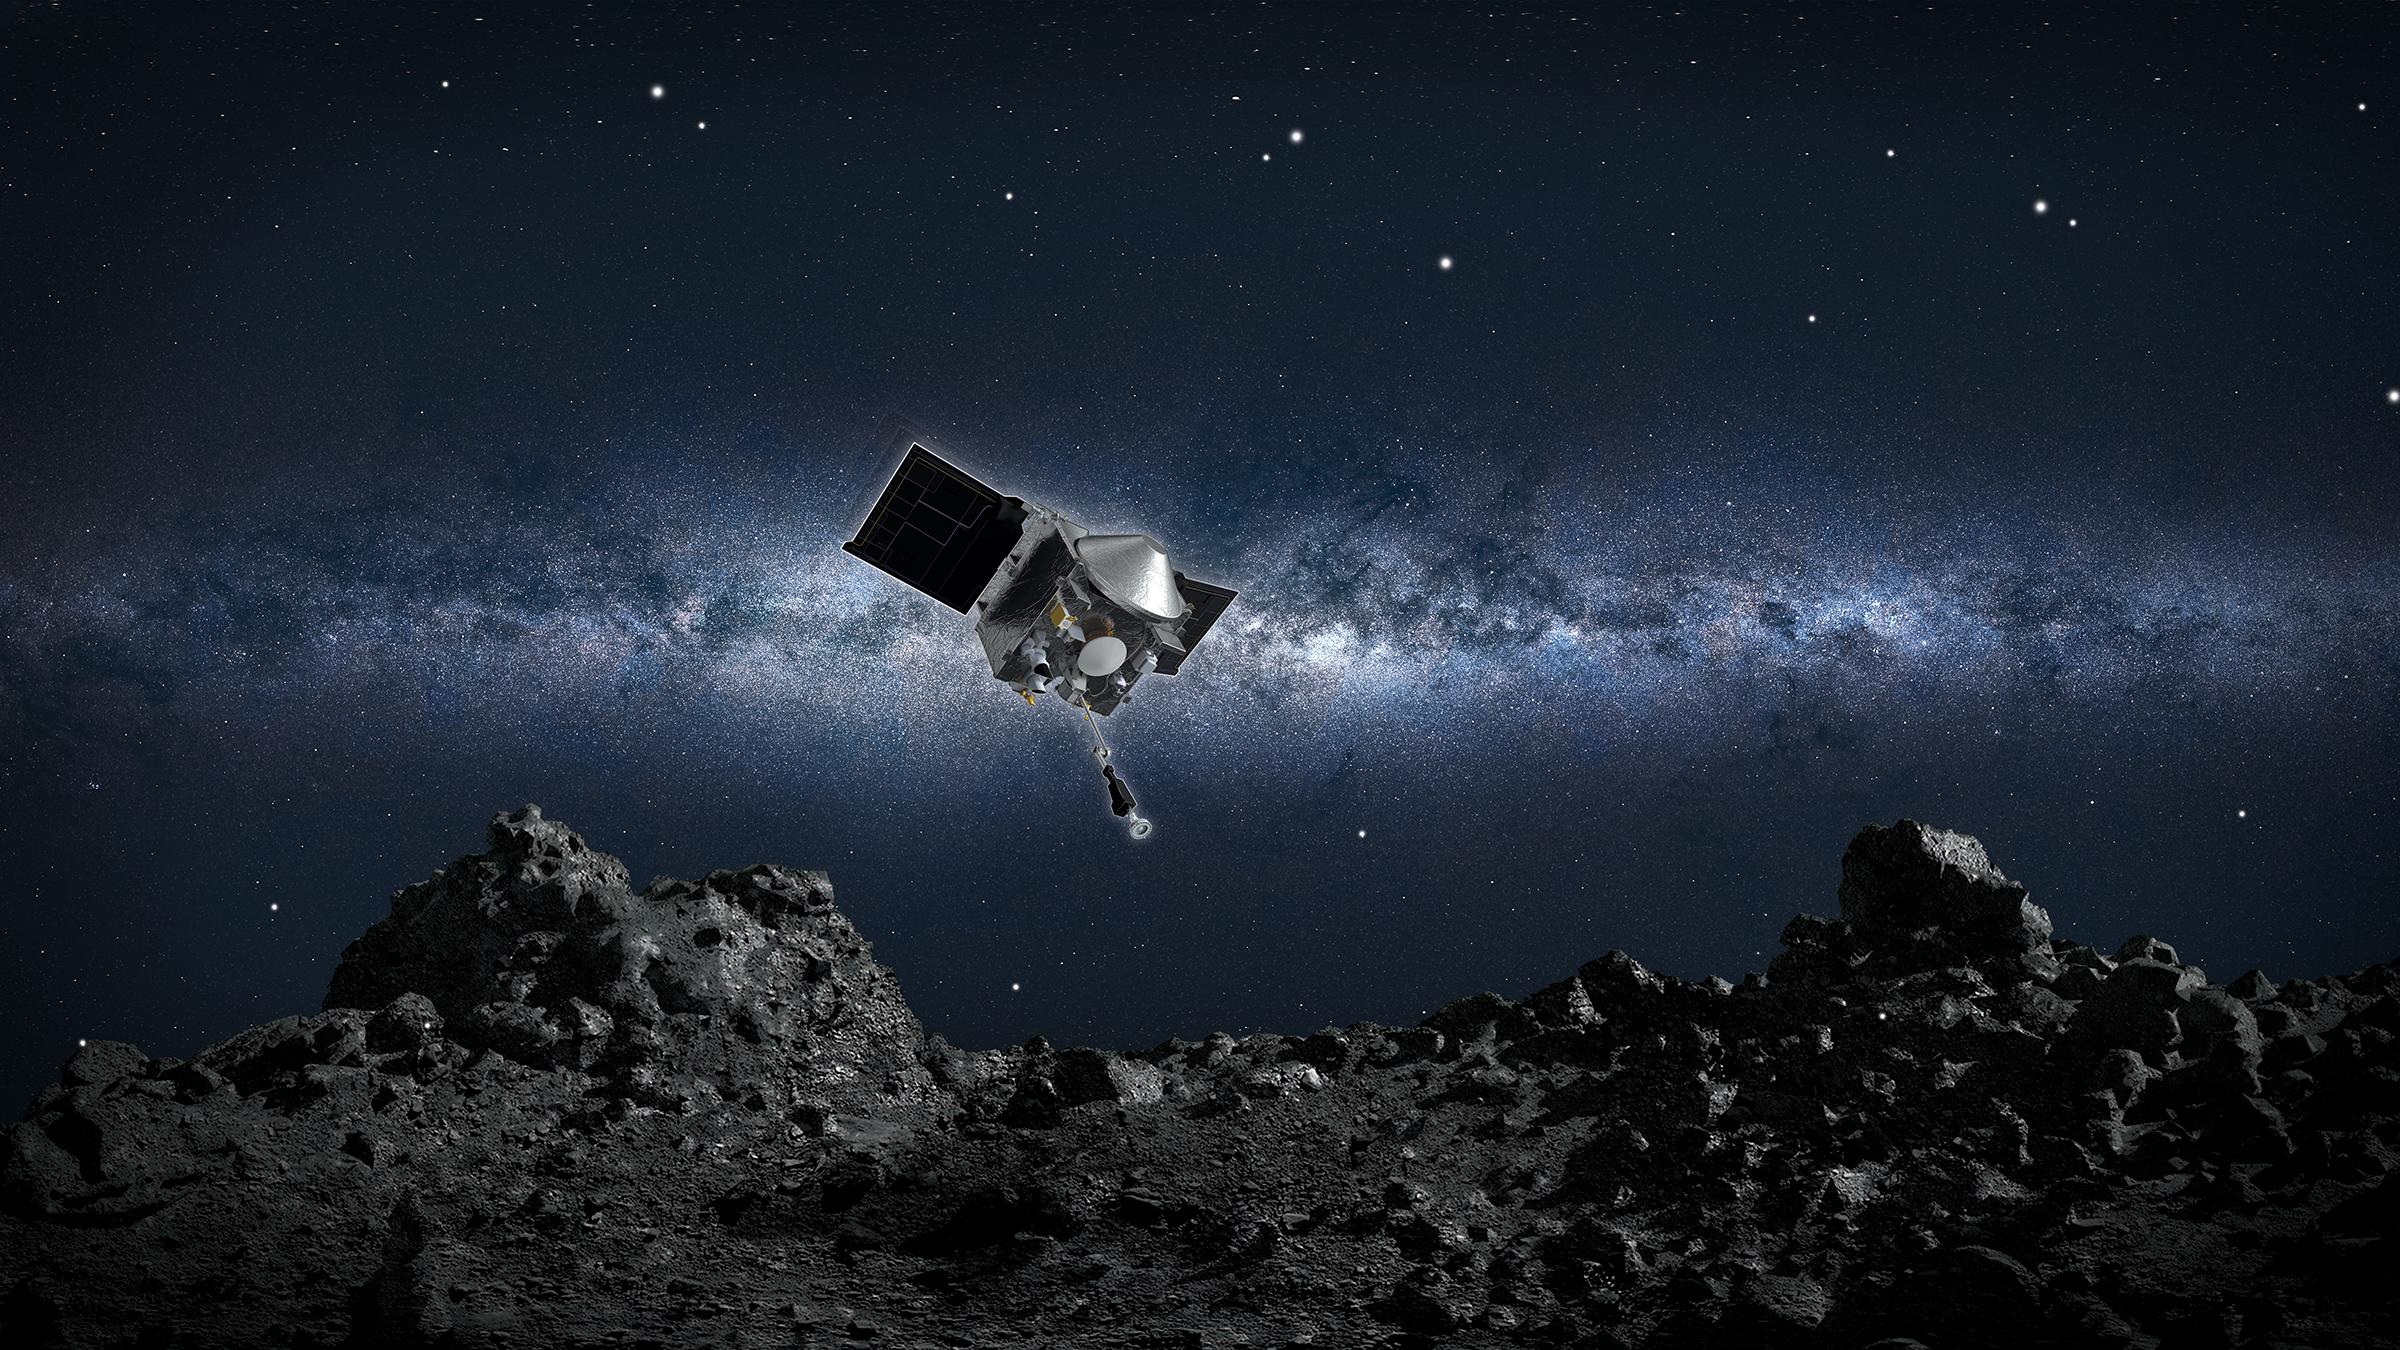 NASA's OSIRIS-REx Spacecraft Briefly Lands on Asteroid Bennu for Sample Collection Attempt